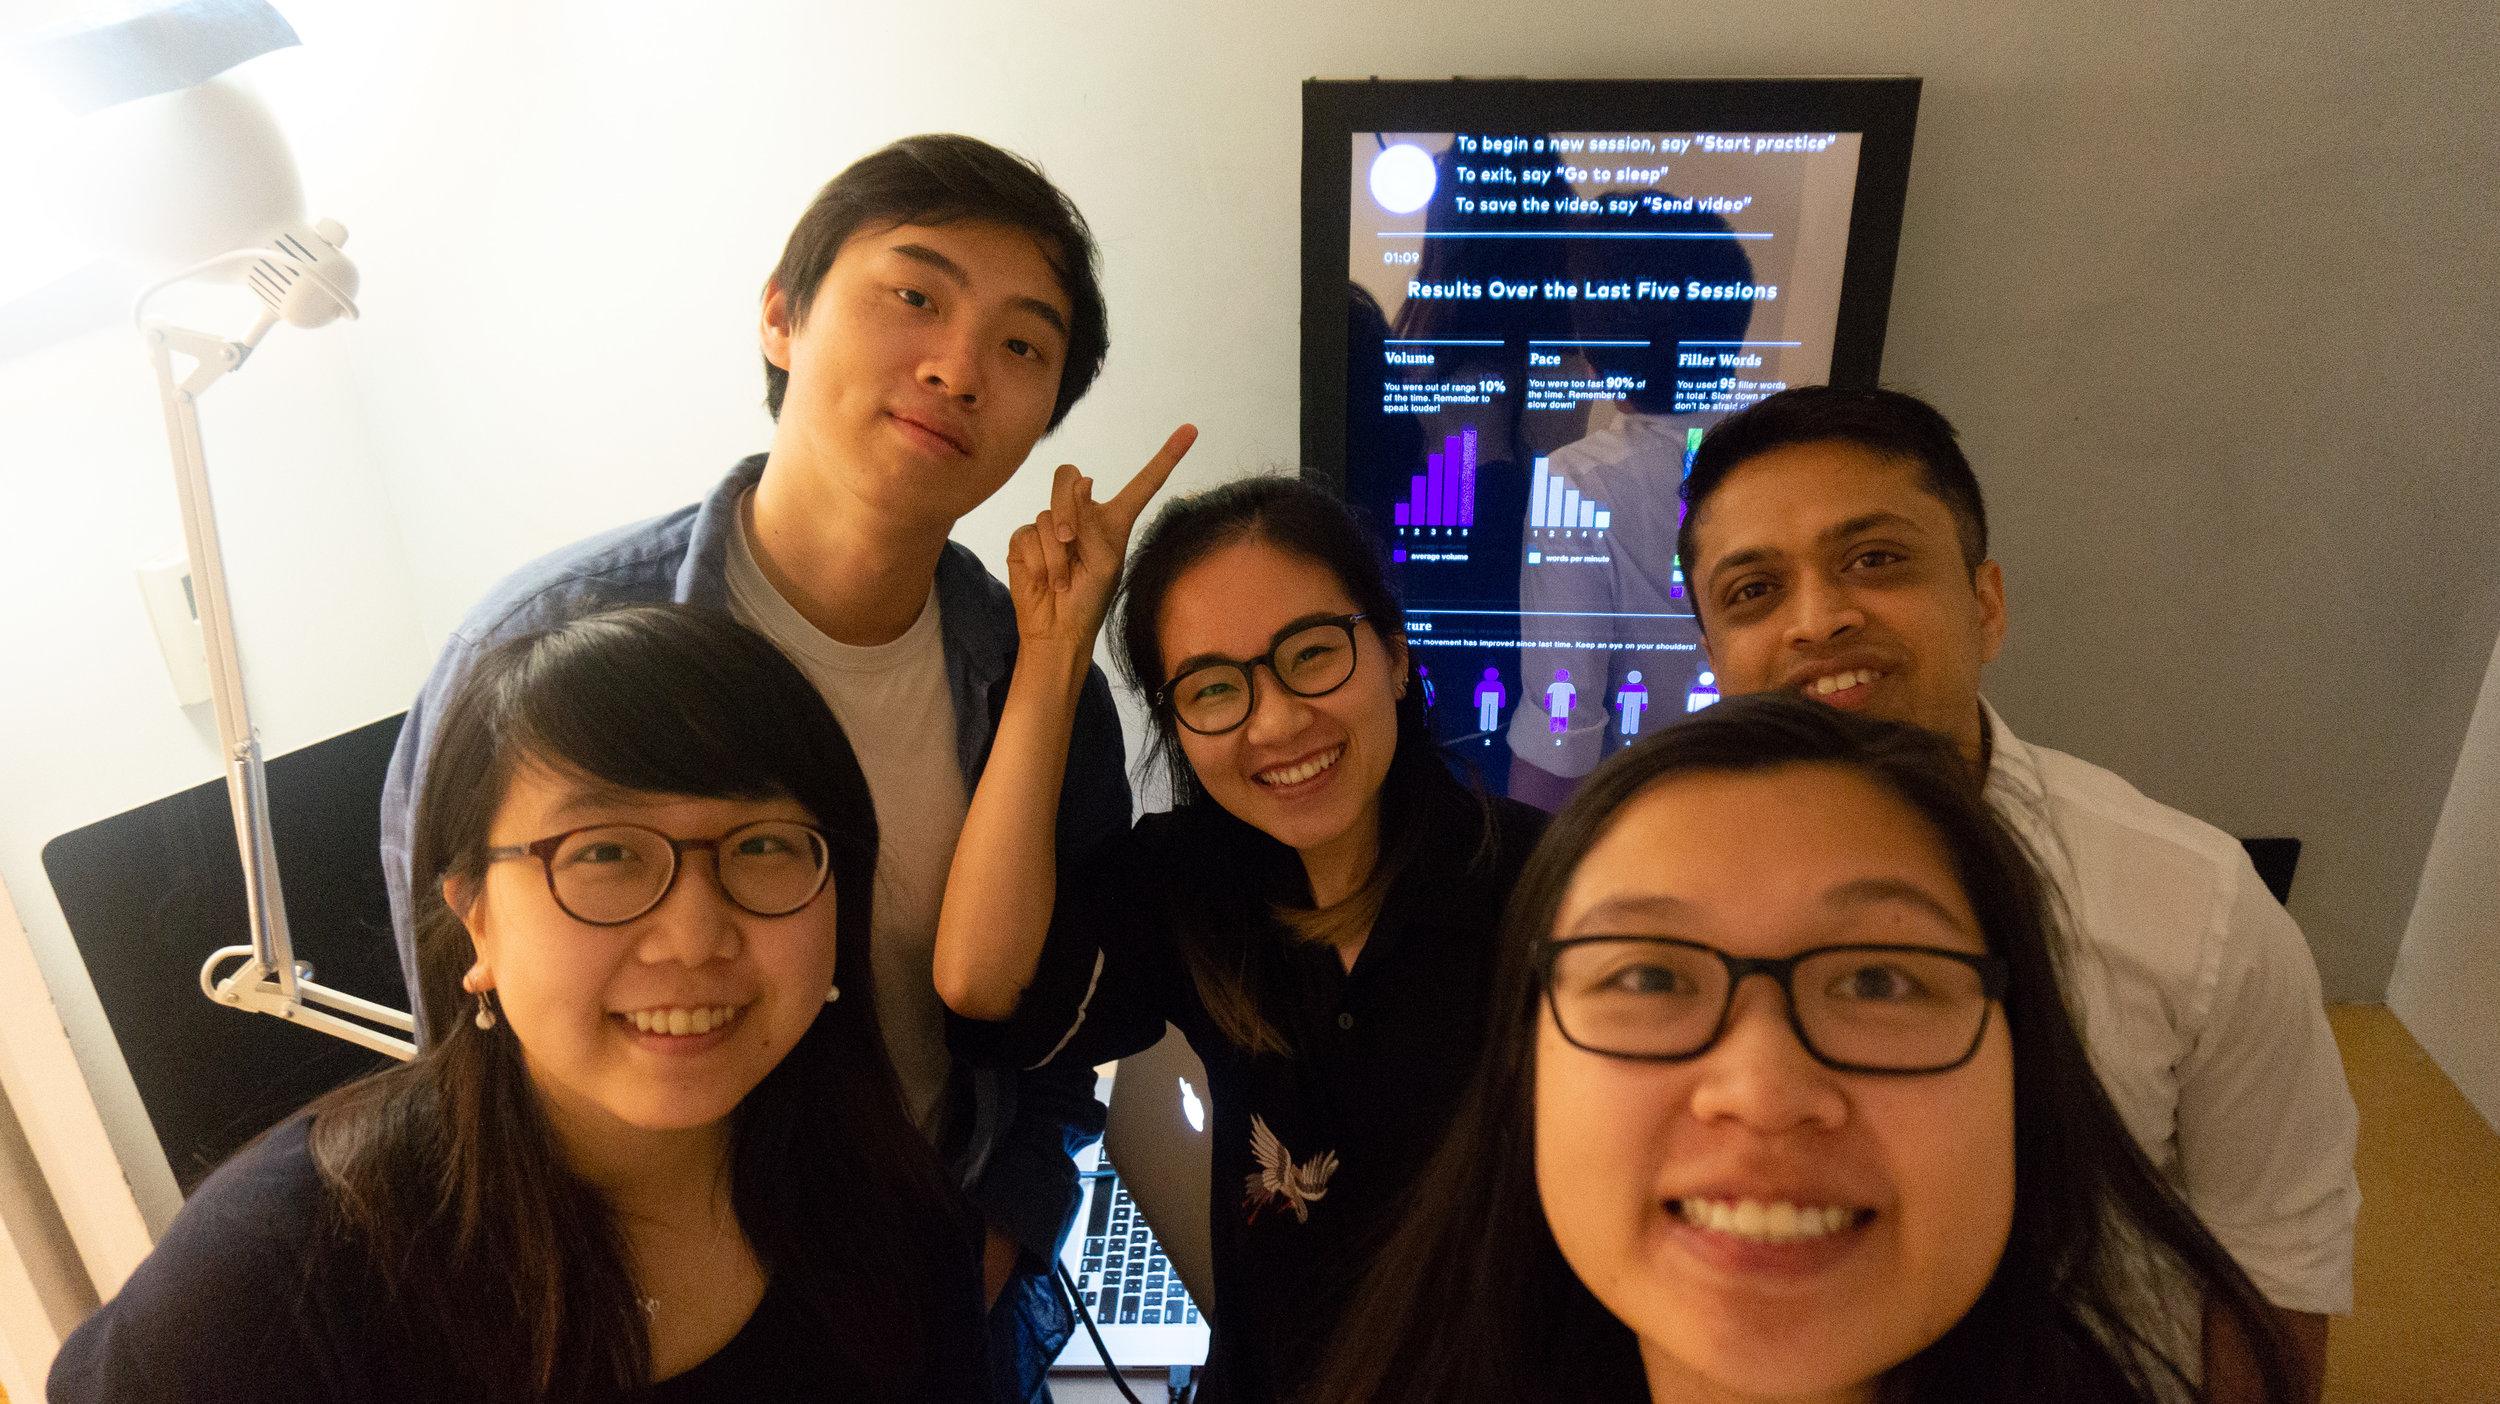 [from left to right]      Crystal Wang     ,      Ke Hu     , myself,      Margarita Yong     ,      Abhinav Sircar